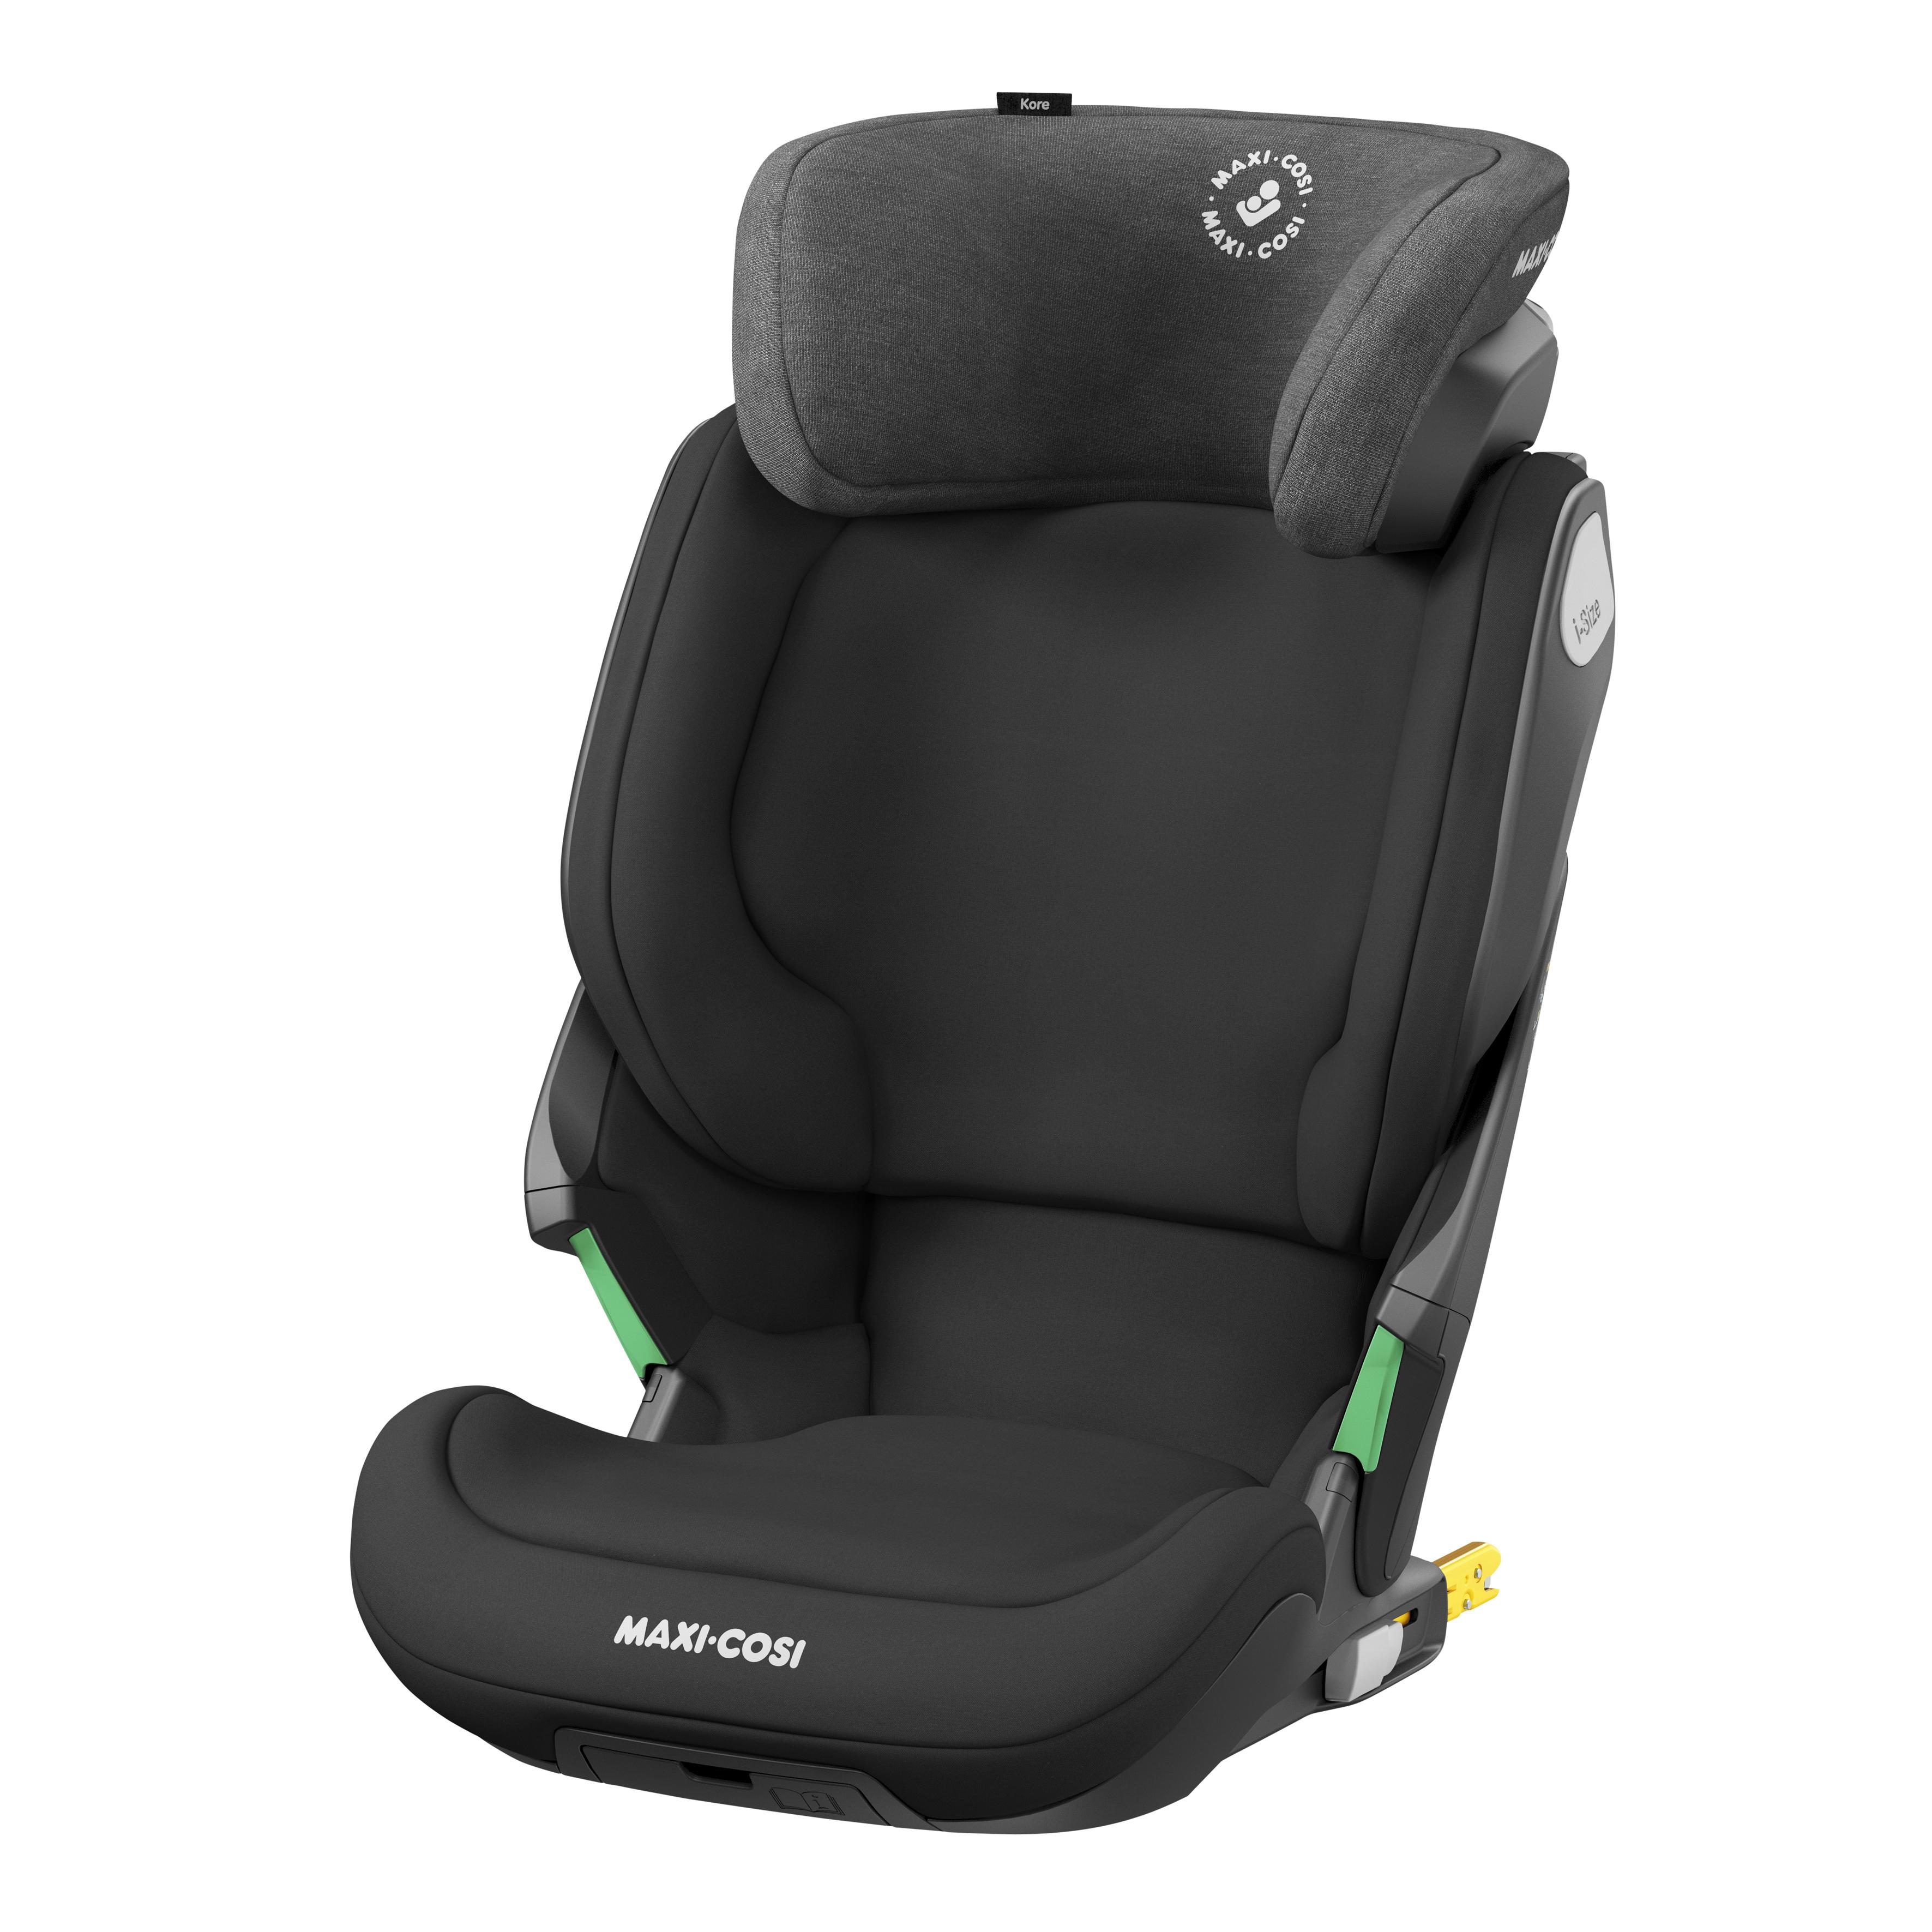 Maxi-Cosi Child Car Seat Kore i-Size